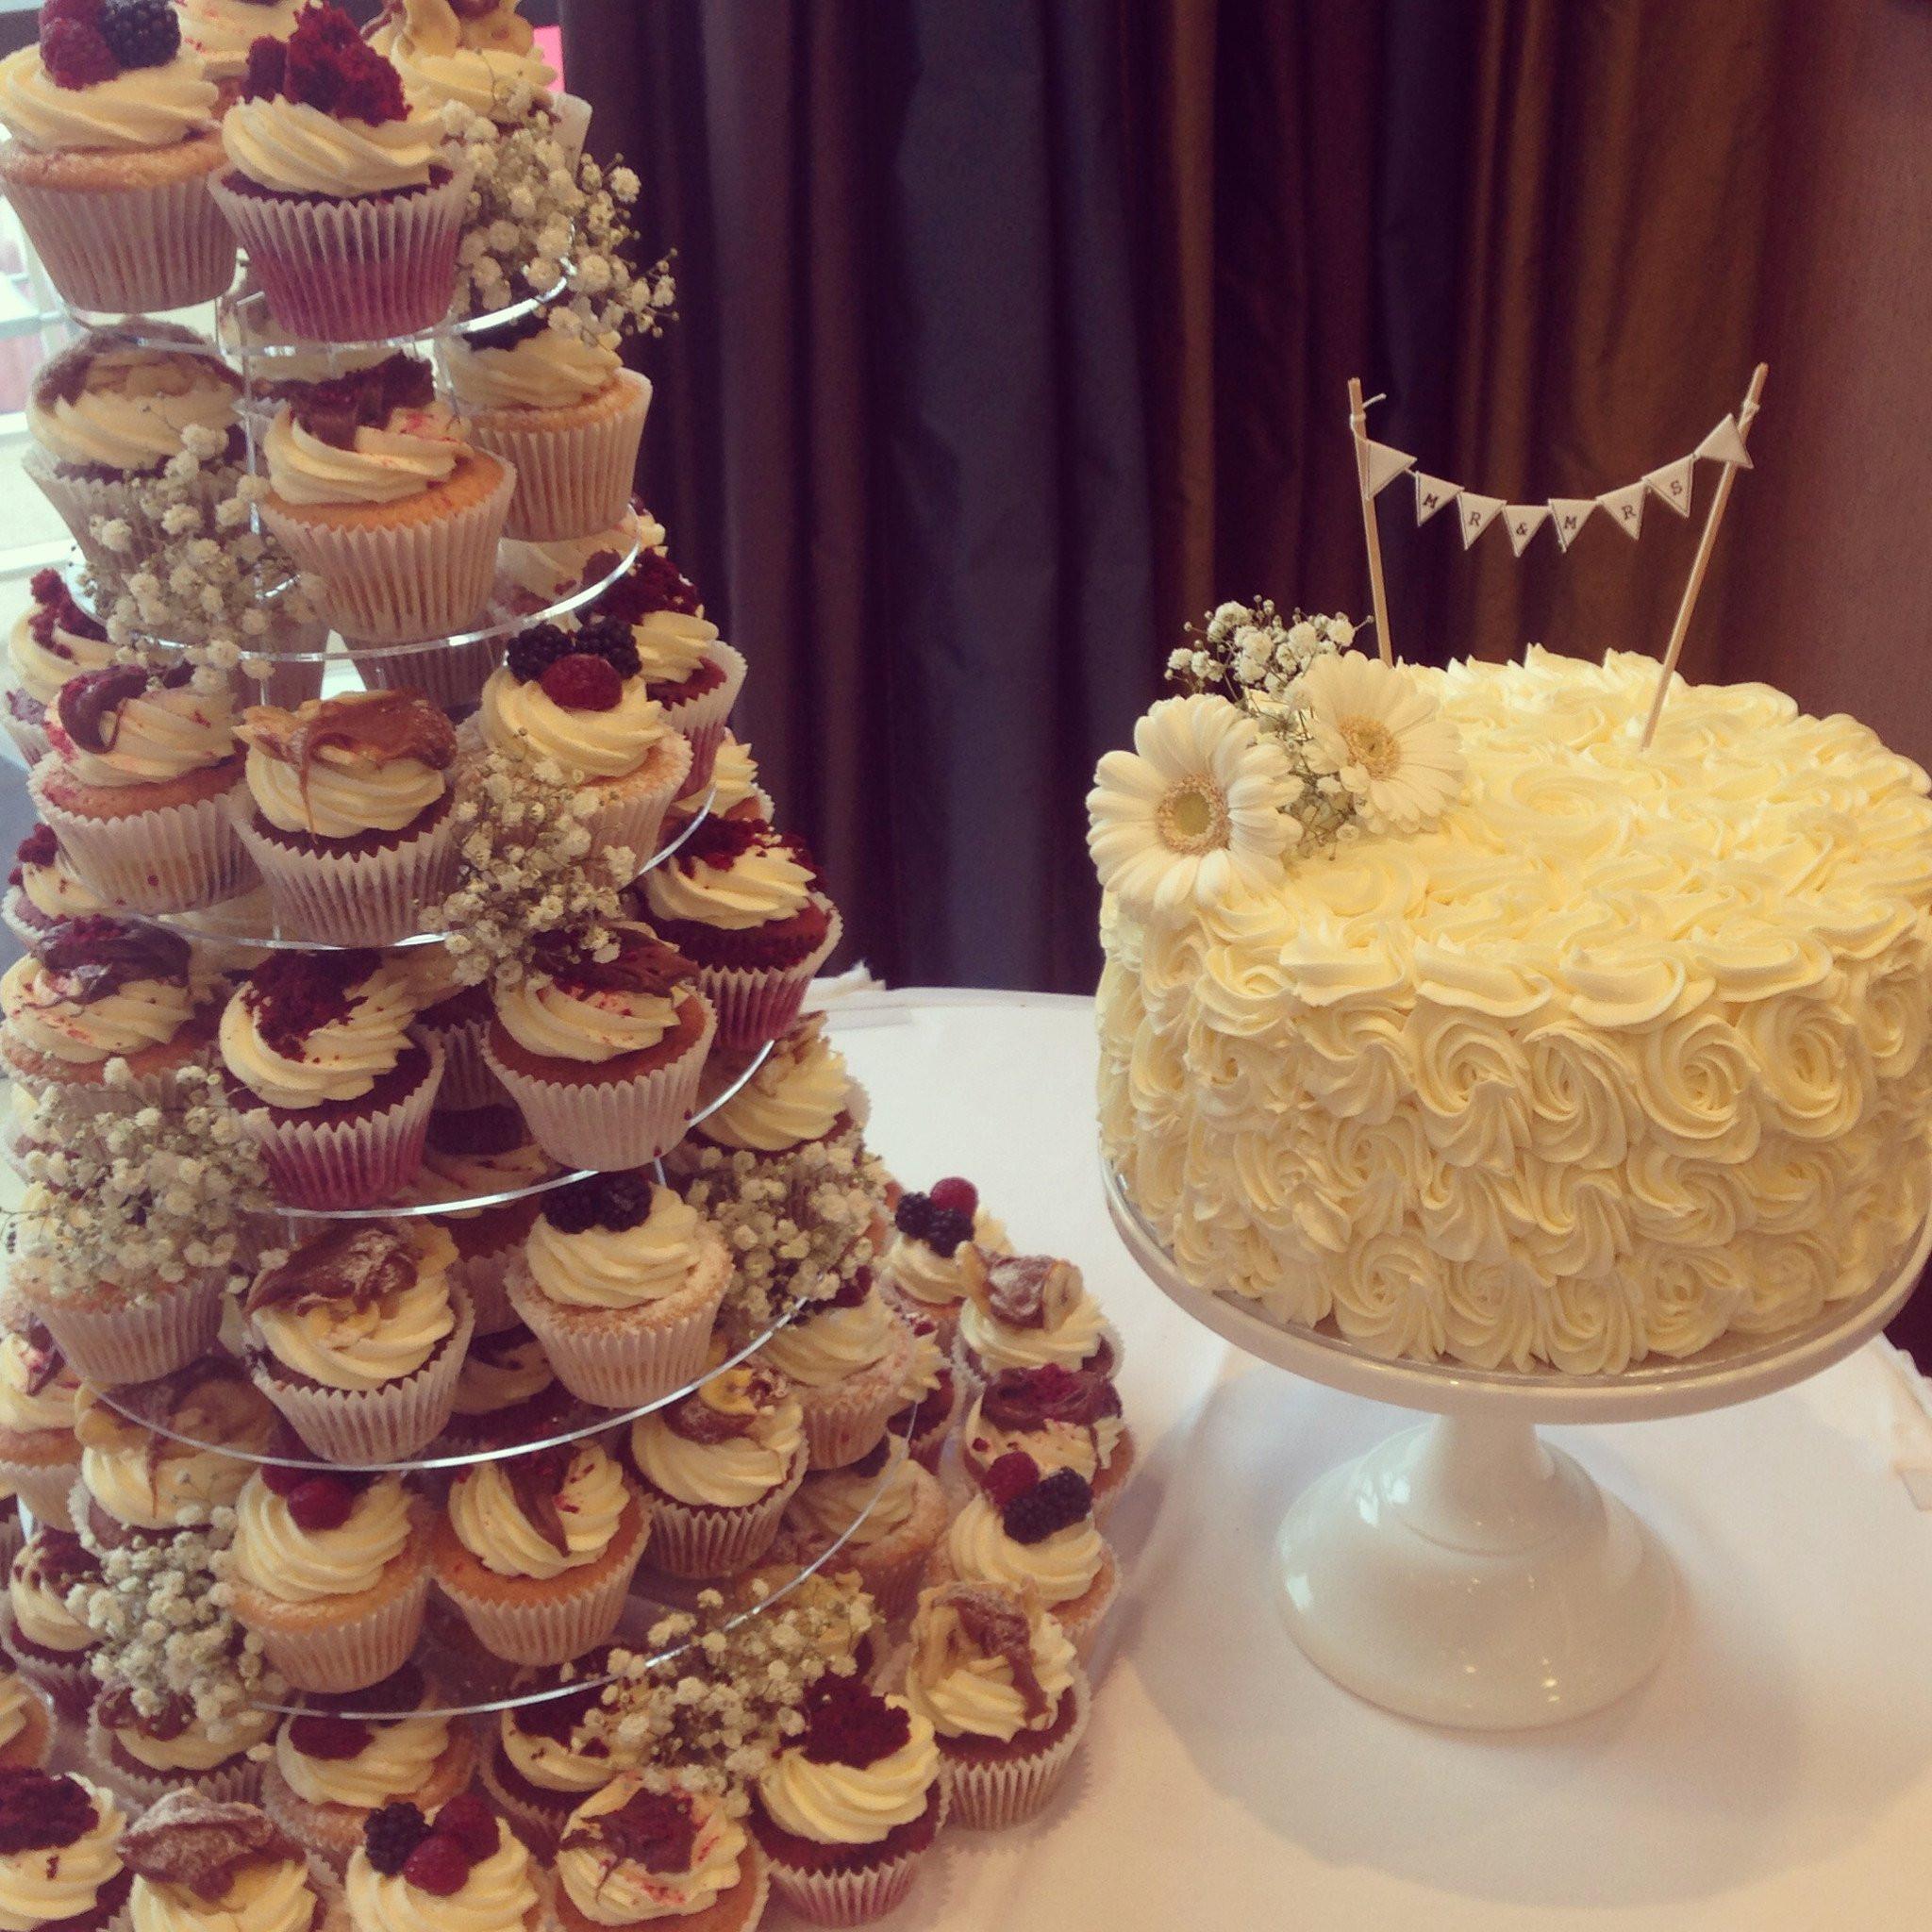 Wedding Cakes On Line  Tiered Wedding Cake Order Cakes line